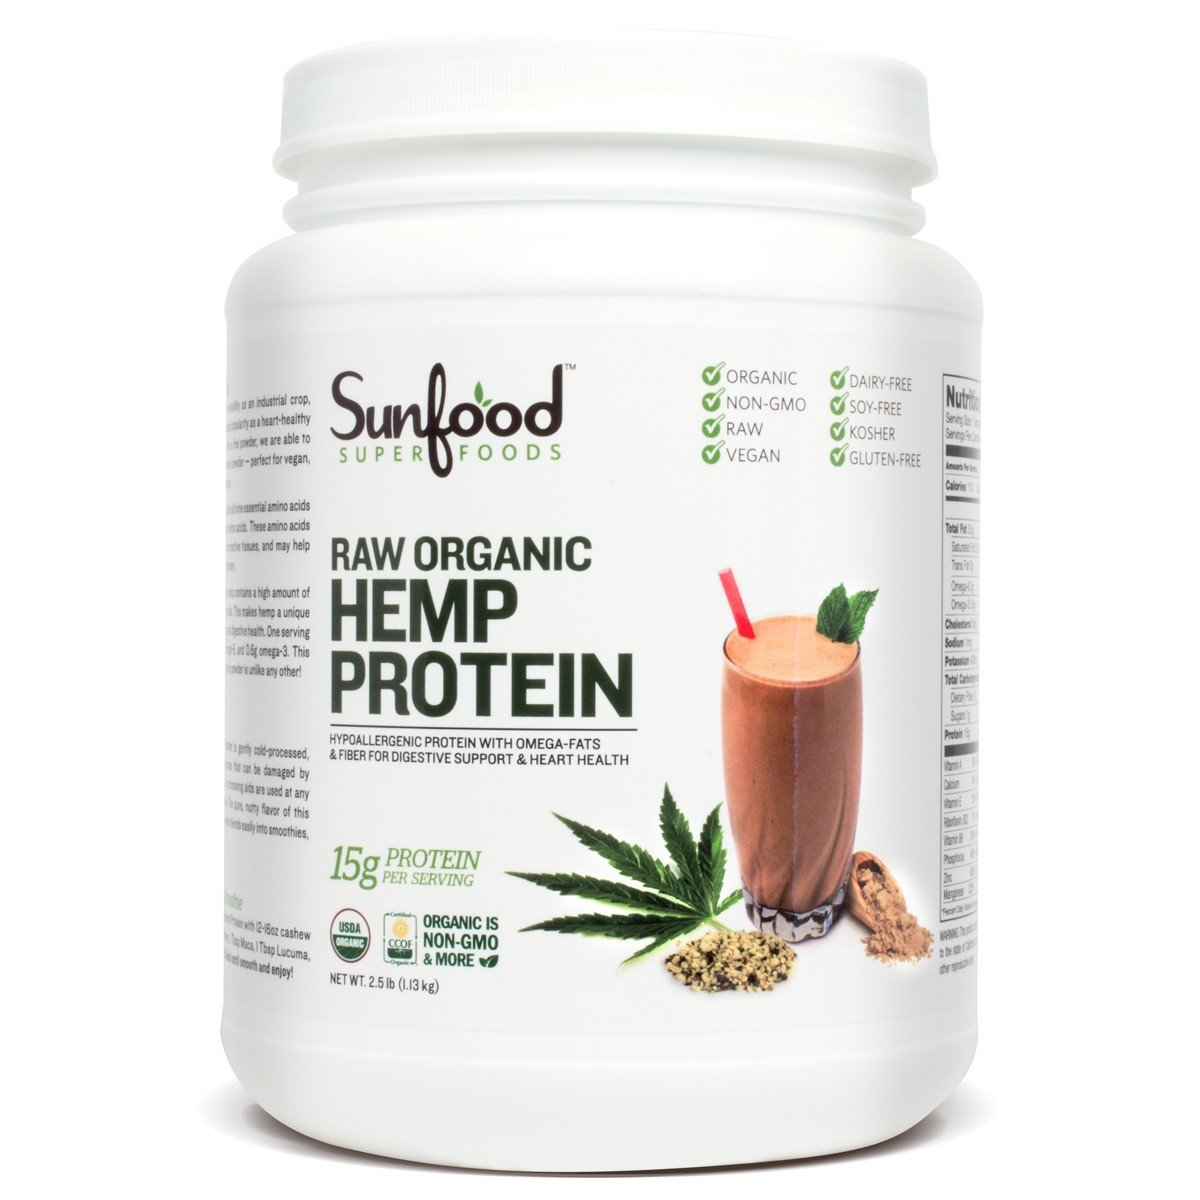 Sunfood Hemp Protein, 2.5 Pounds Tub, Organic, Raw